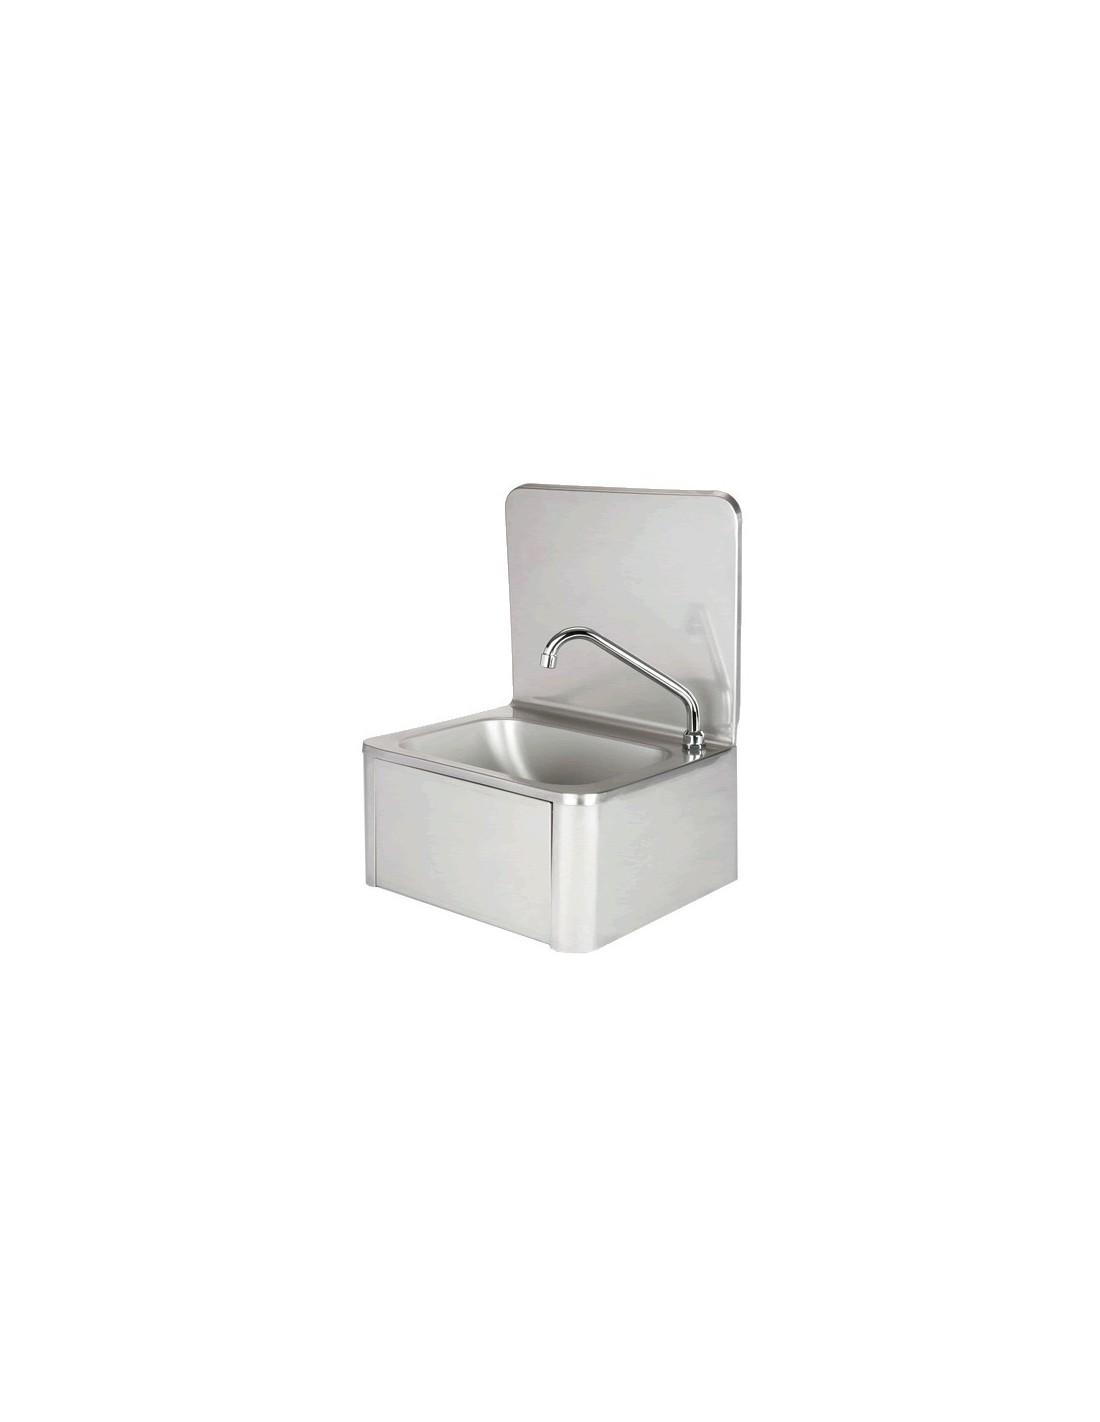 evier en inox lave mains avec robinet et distributeur. Black Bedroom Furniture Sets. Home Design Ideas